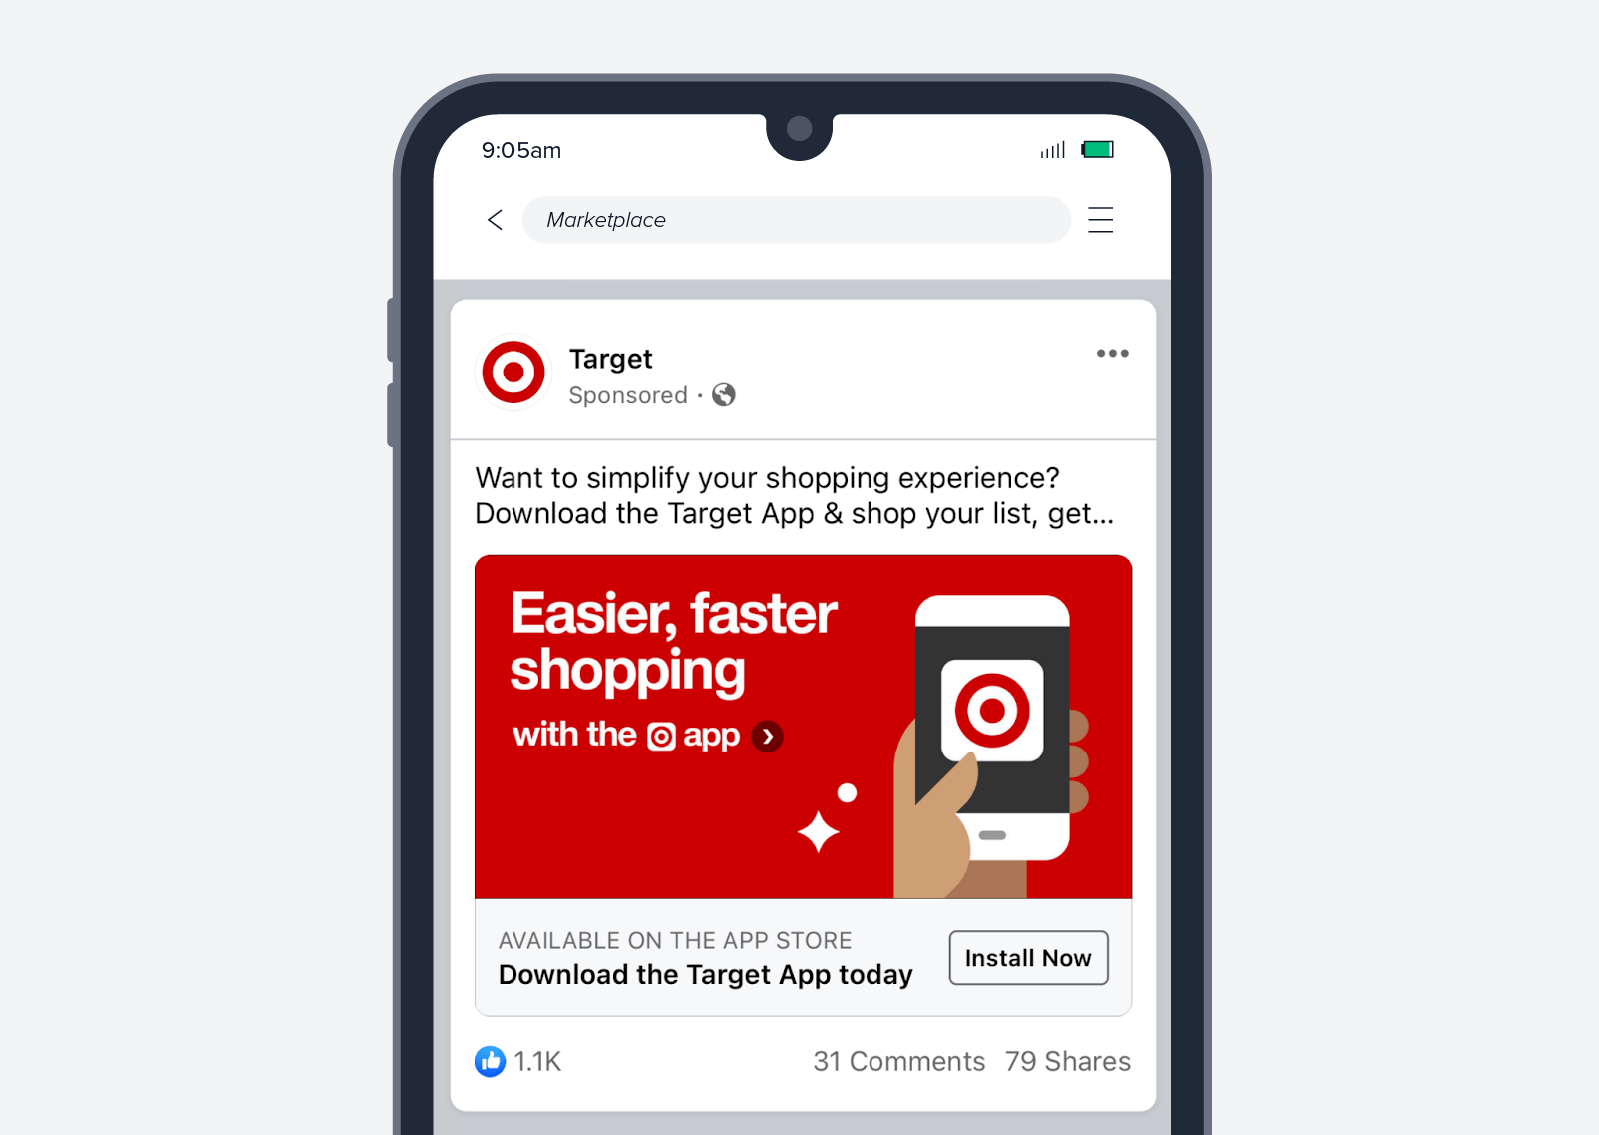 Target app install ad screenshot